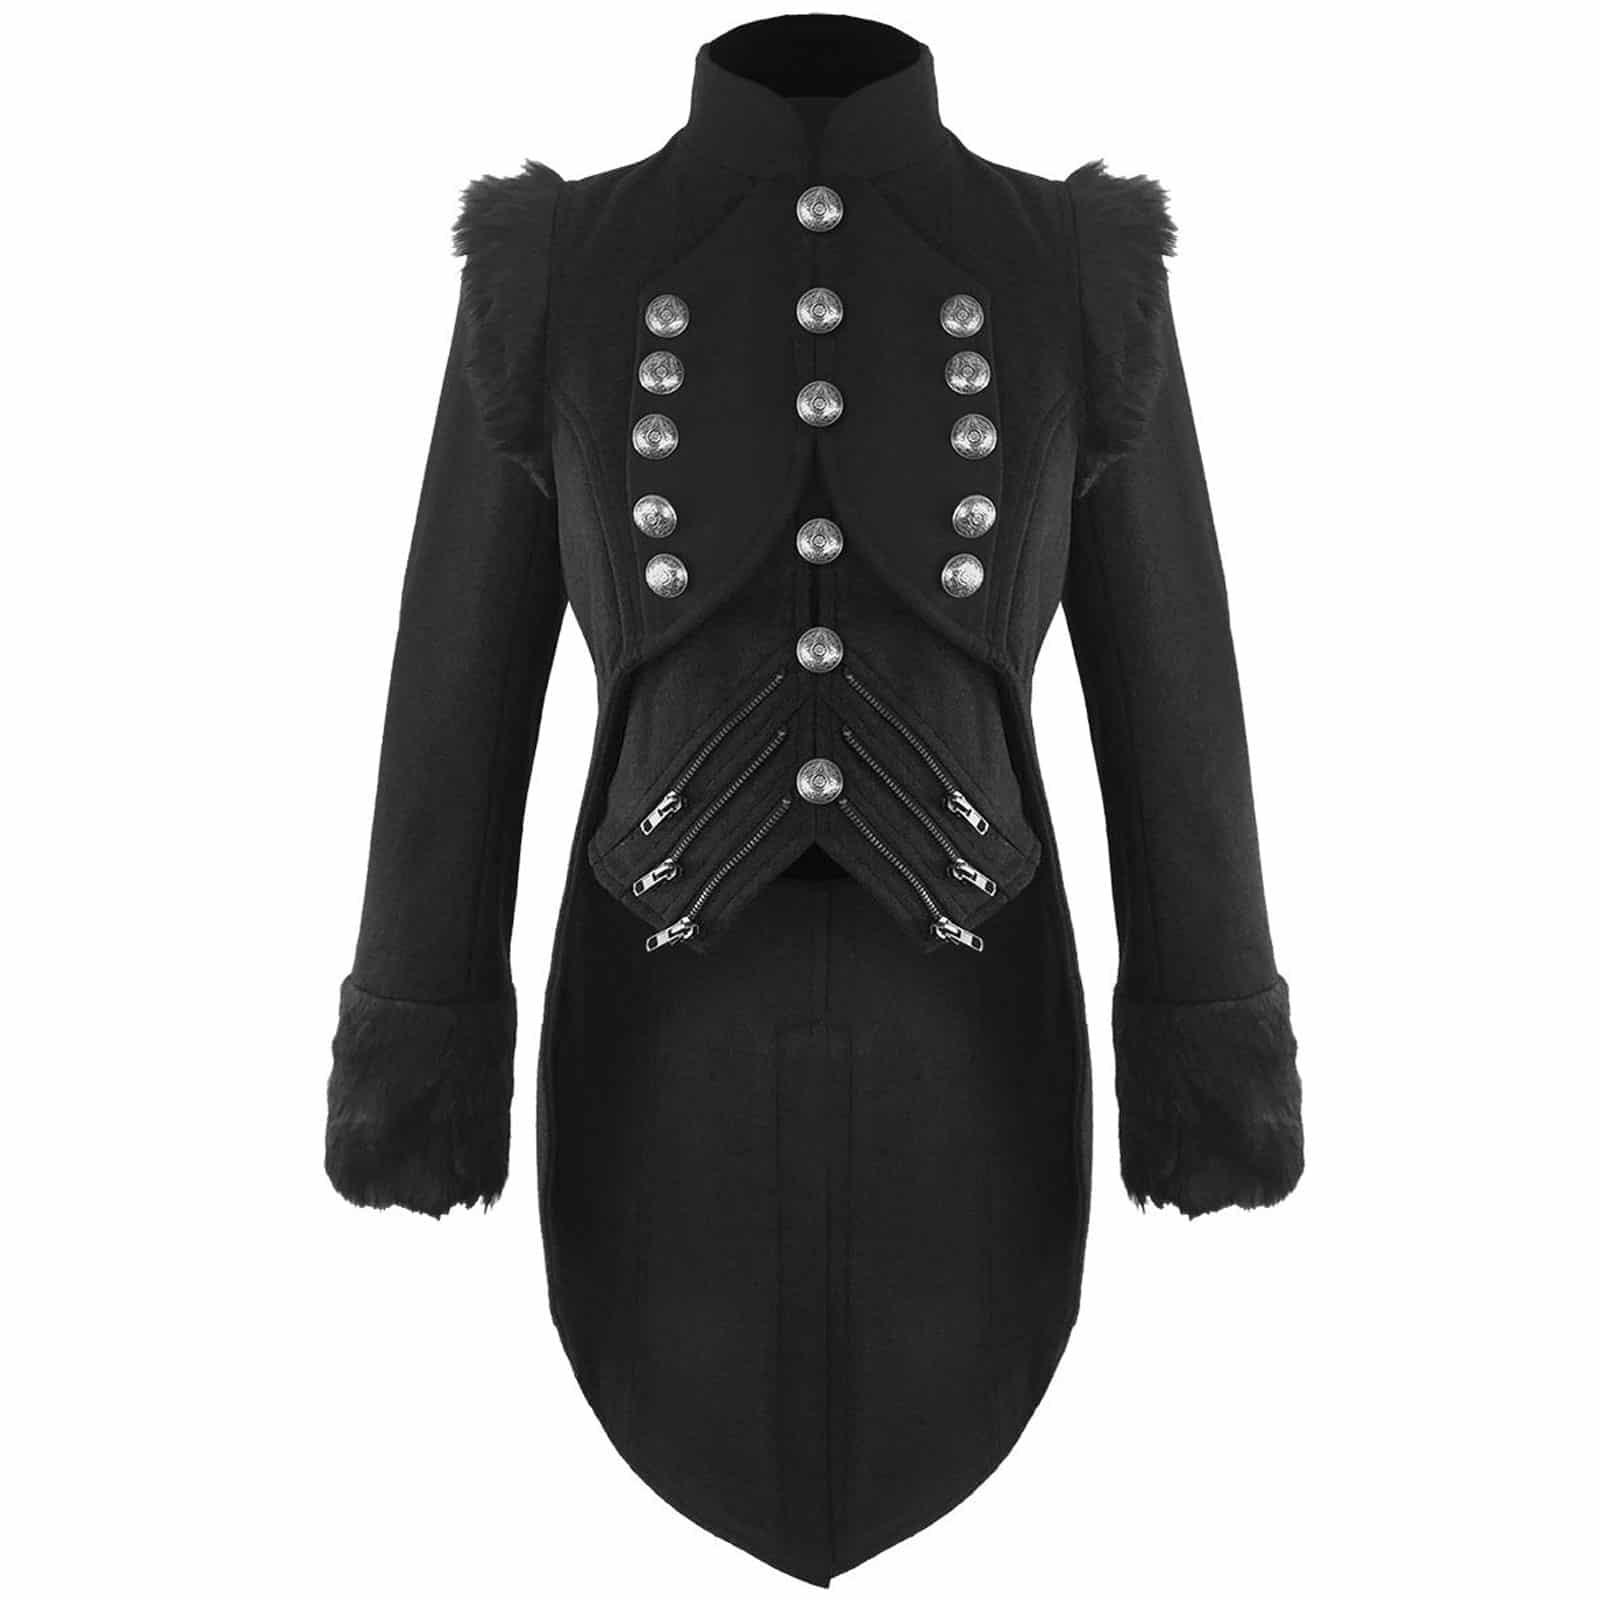 Womens gothic coats